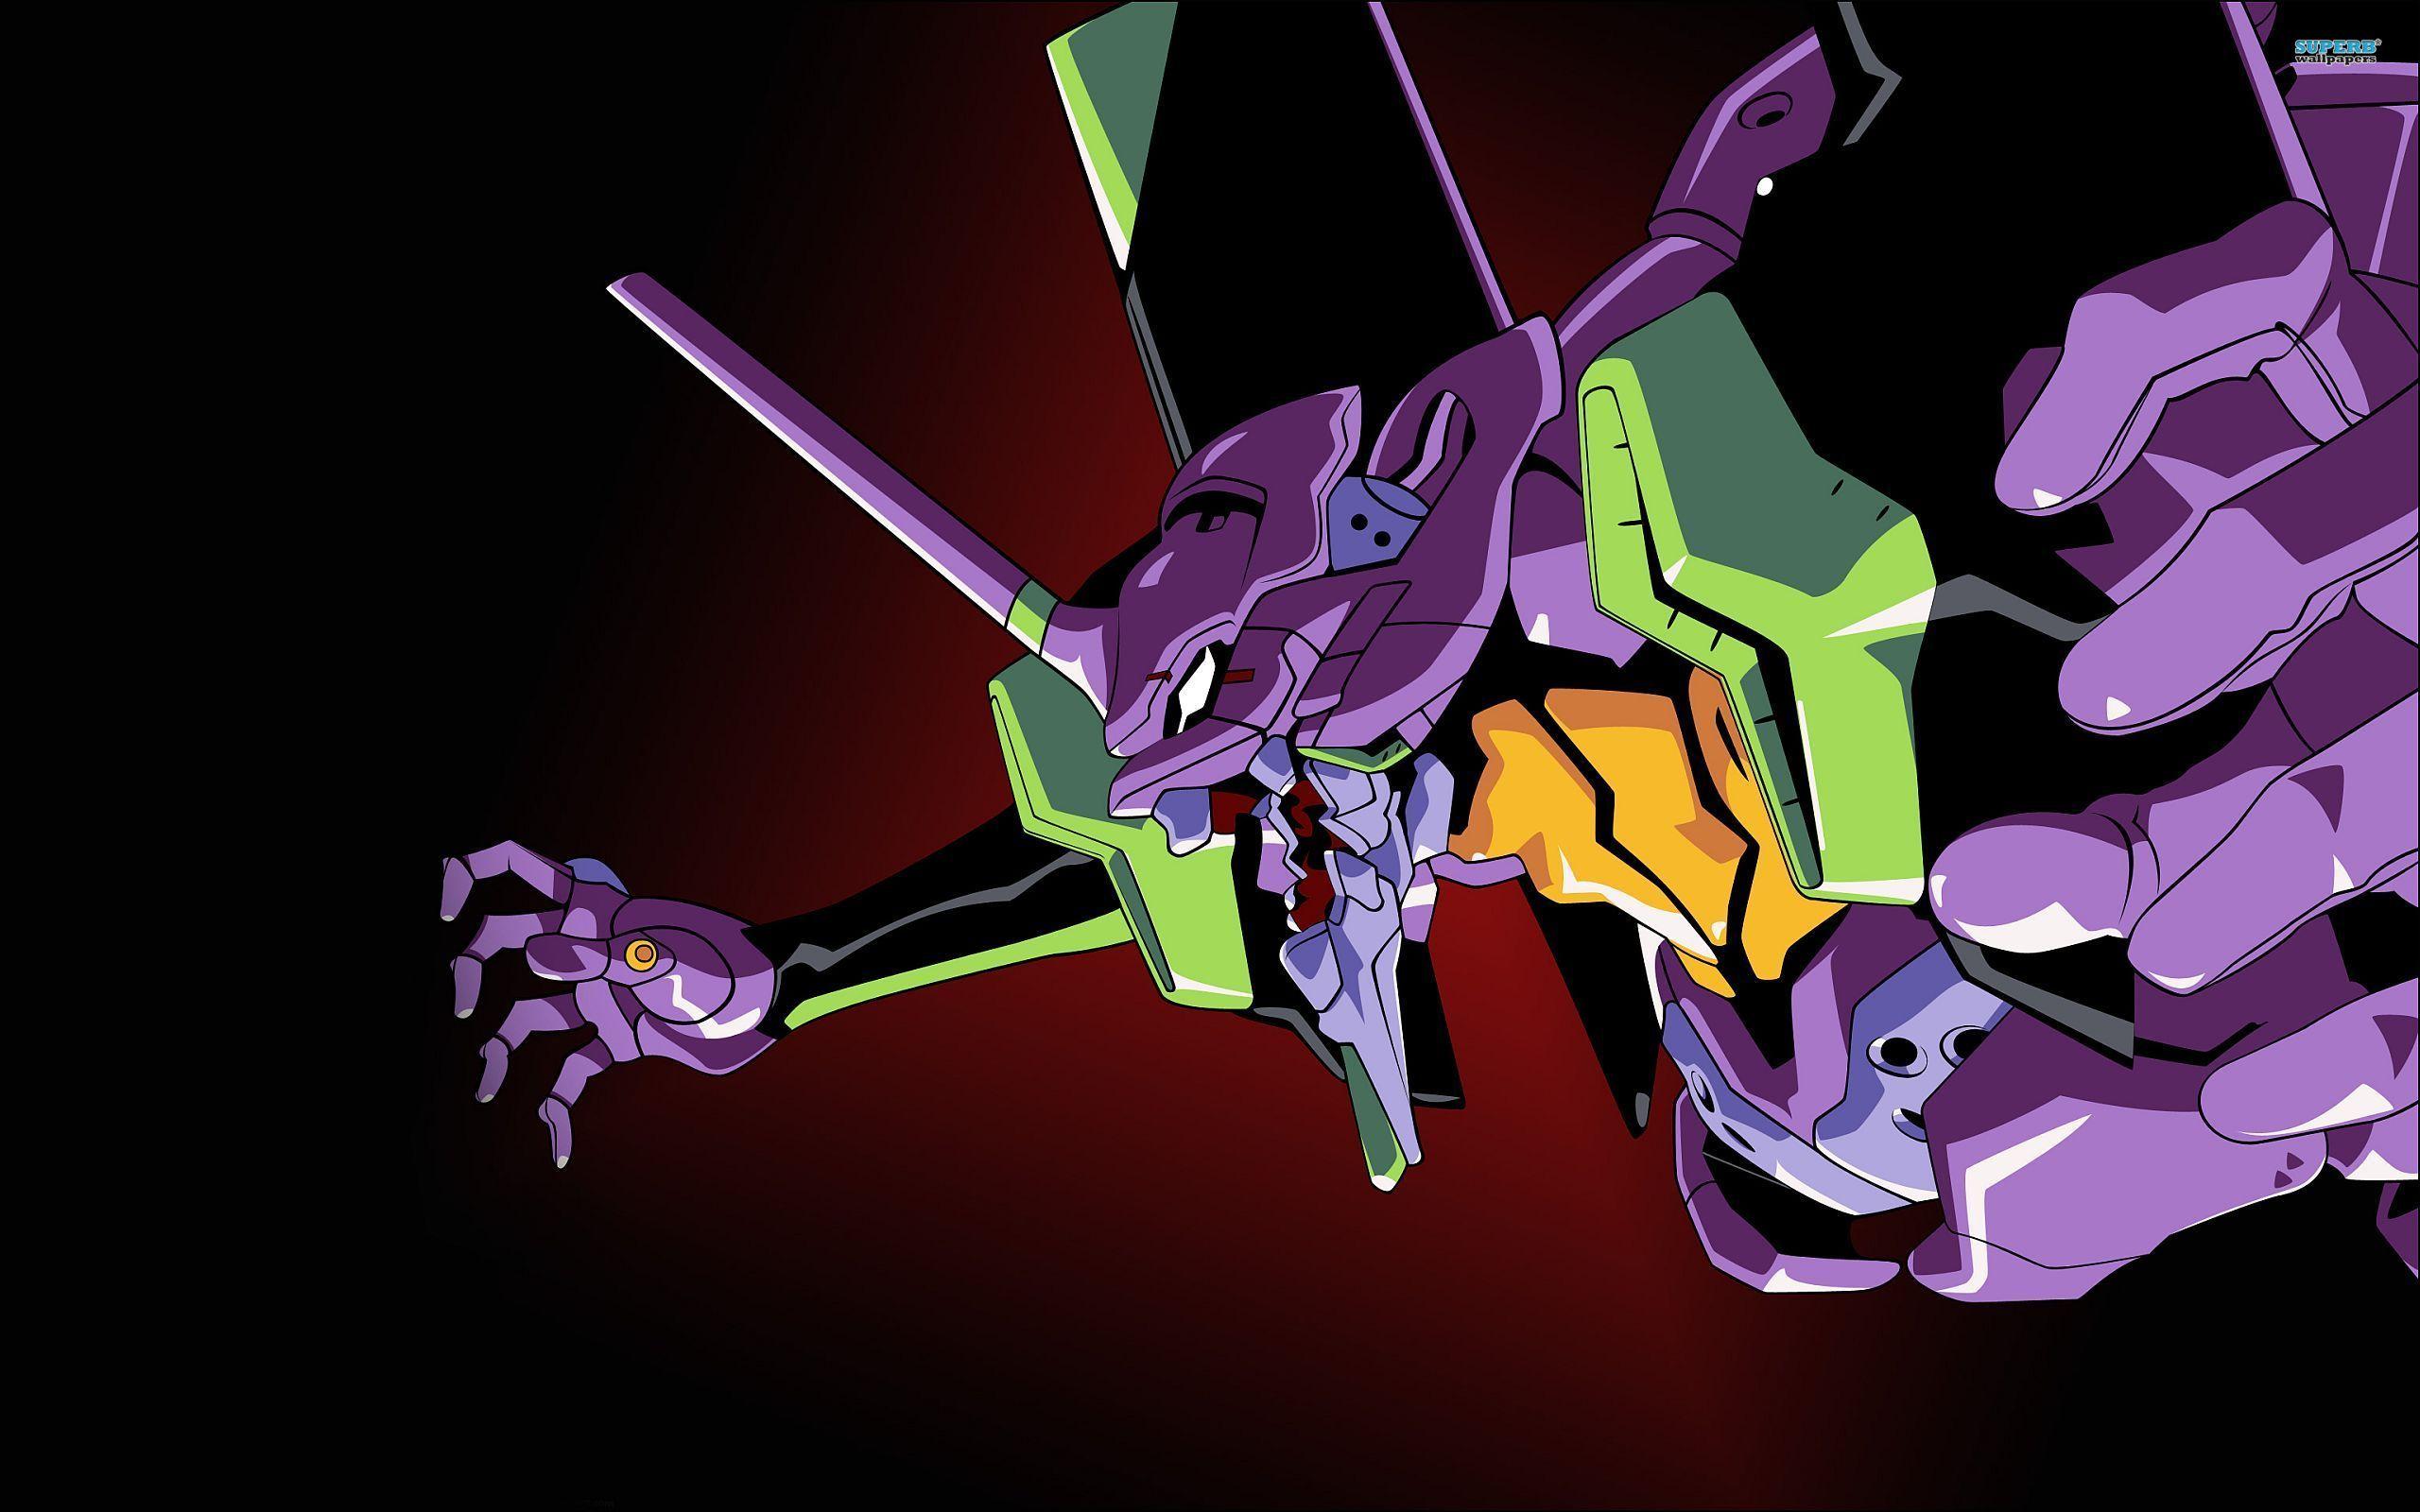 Neon Genesis Evangelion wallpaper 2560x1600 jpg